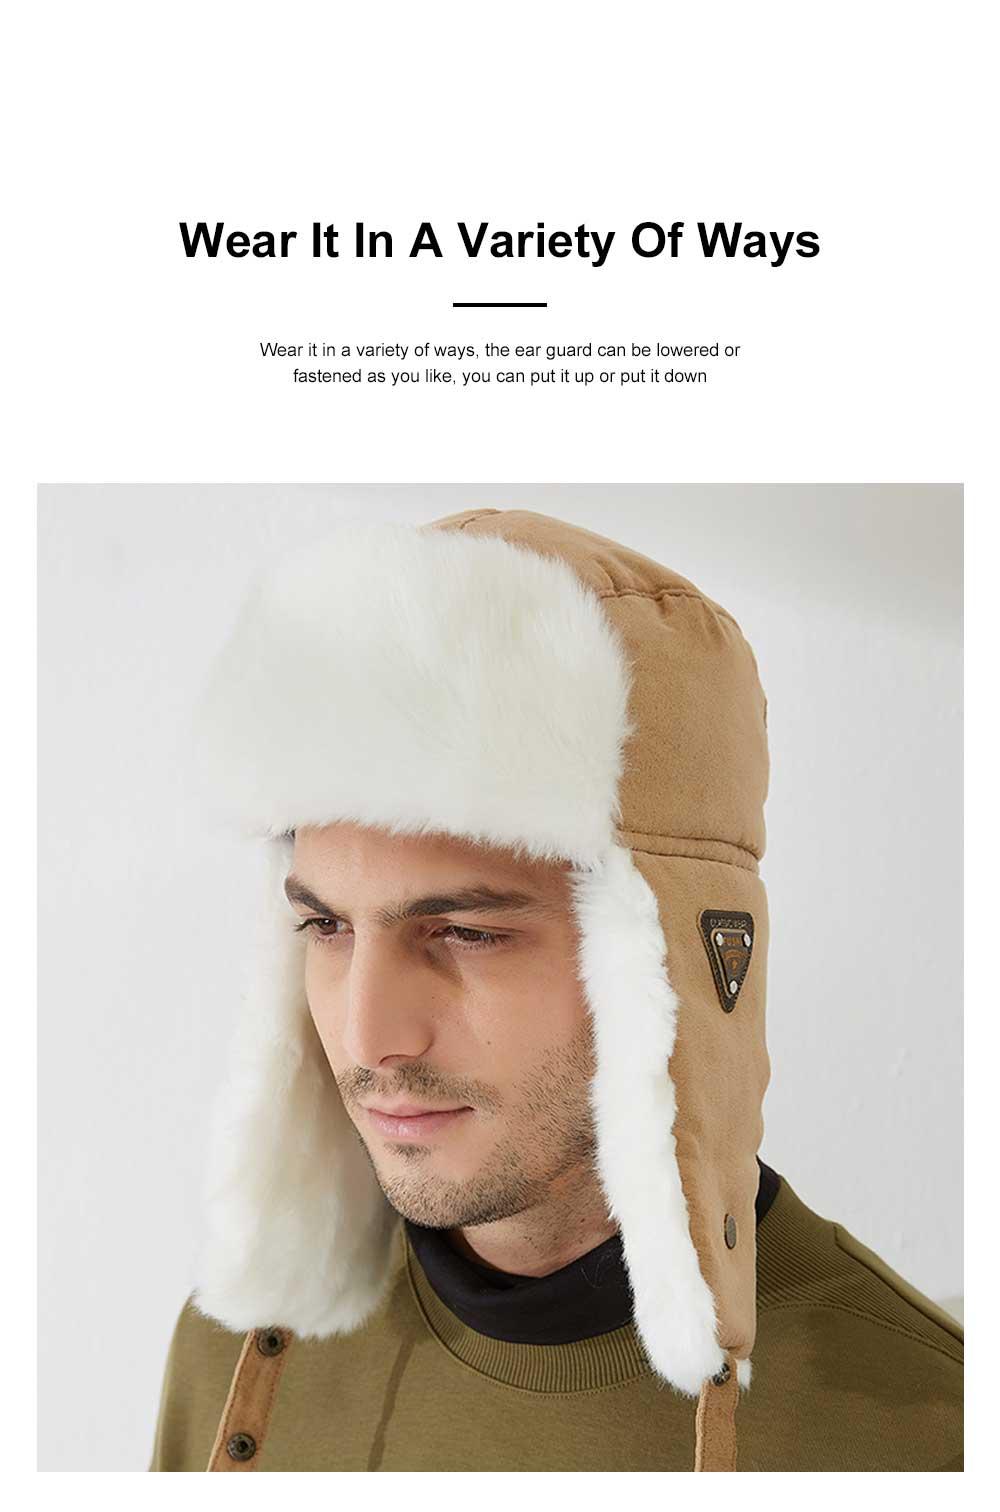 Winter Snow Hat Old Men Thickening Plus Velvet Warm Cap Plush Animal Cap Russian Style Faux Fur Hat With Ear Flaps Ski Earmuffs 1